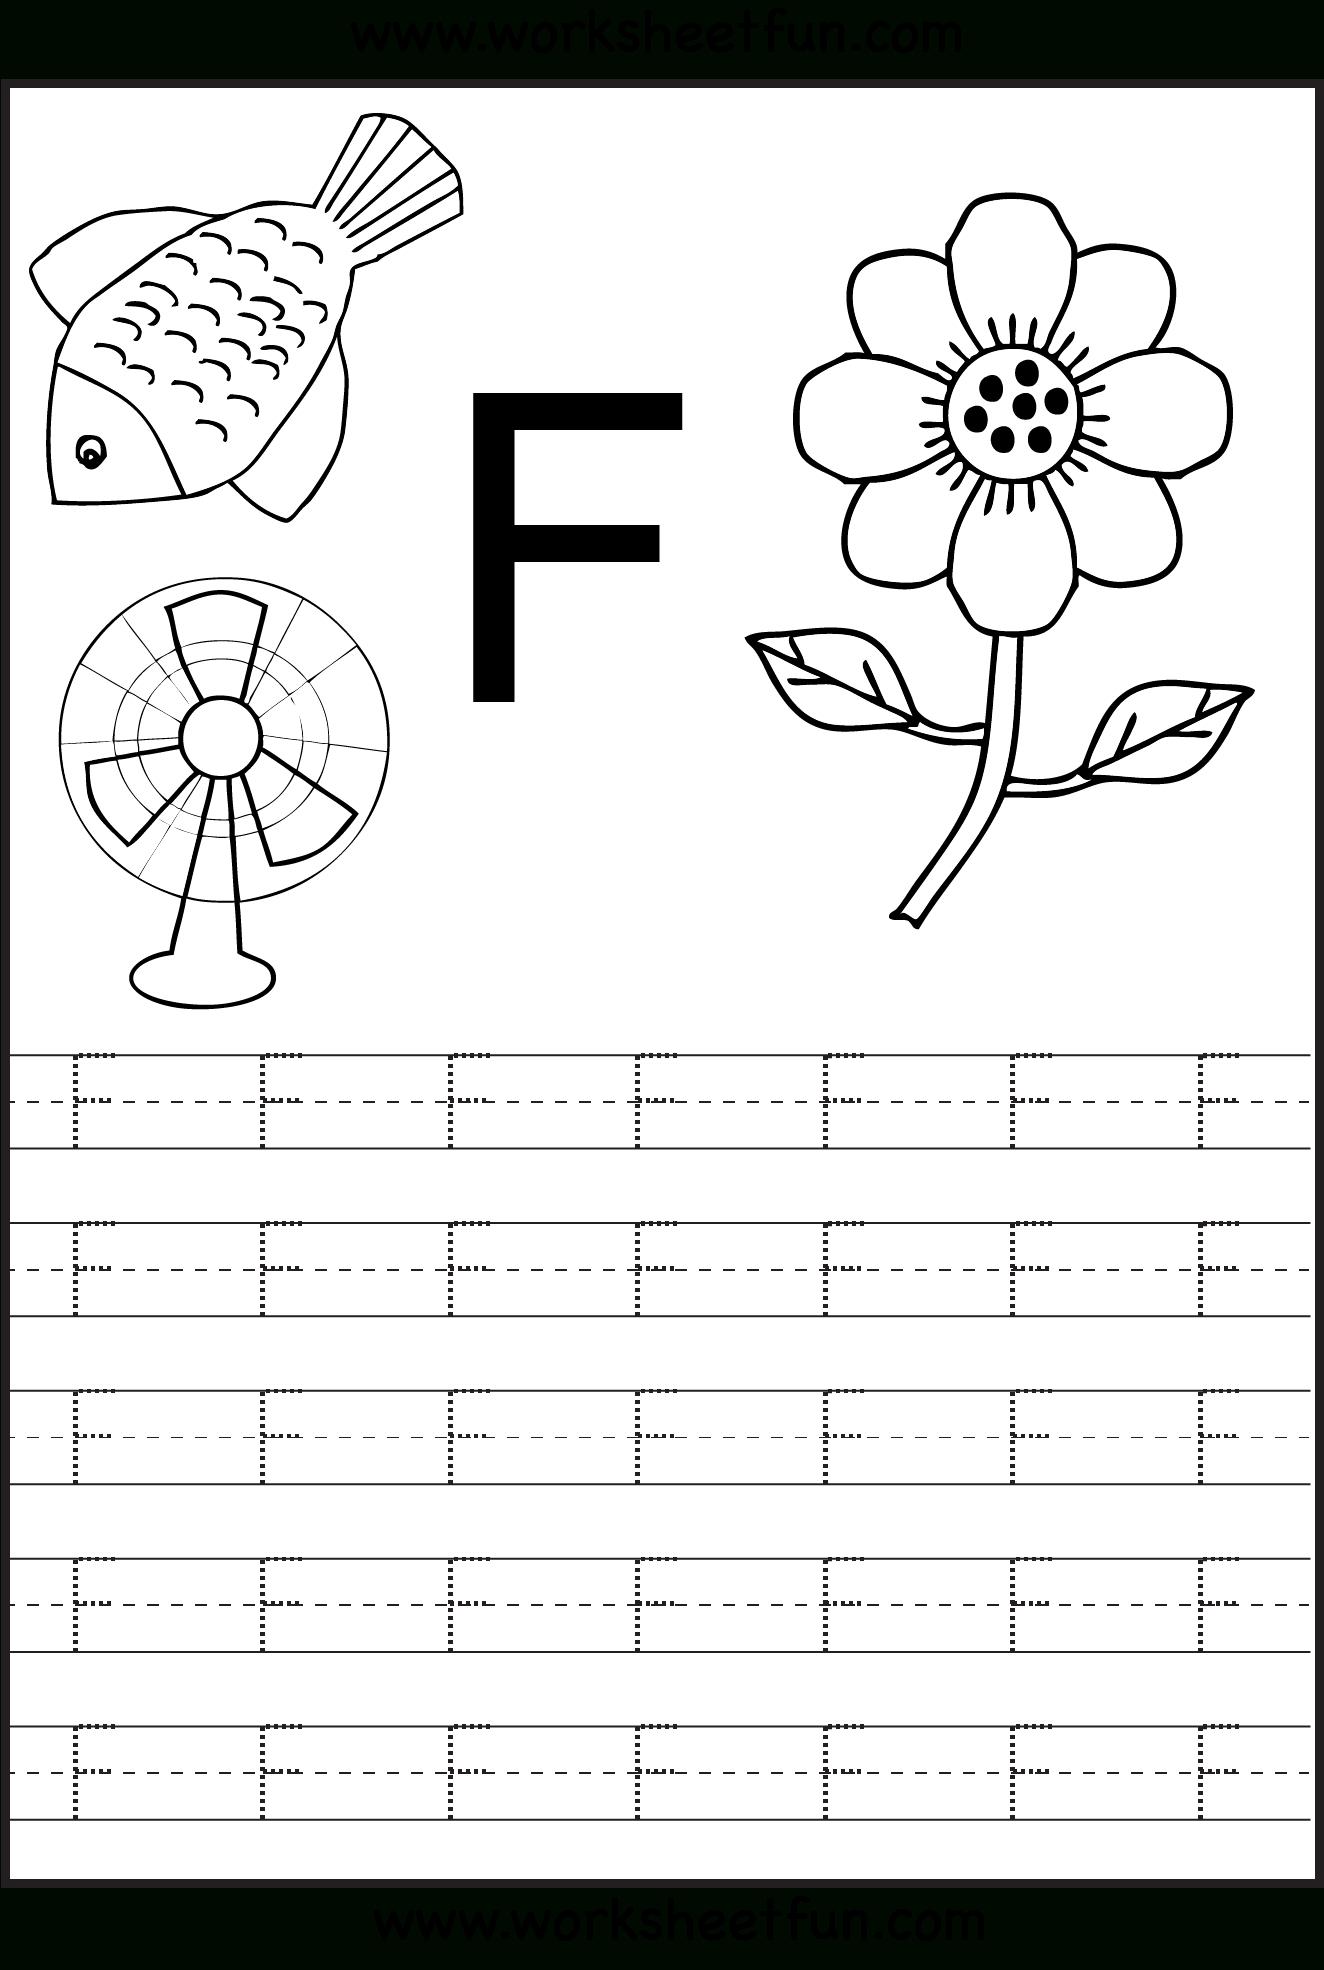 Letter F Worksheets | H3Dwallpapers - High Definition Free inside Letter F Tracing Preschool